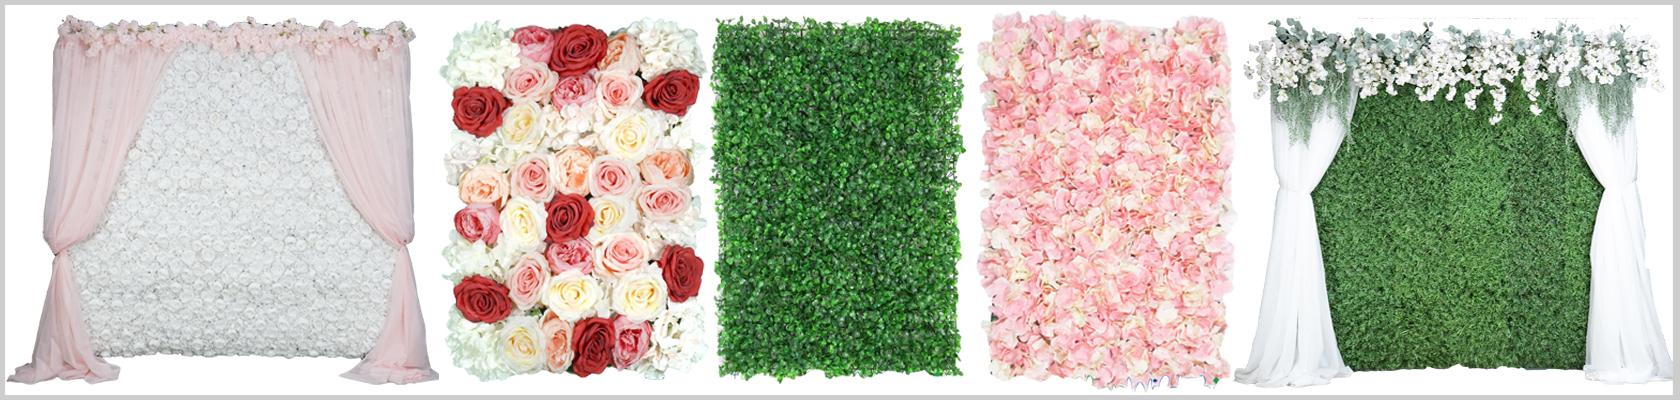 Landscape Walls & Flower Walls Premium Quality